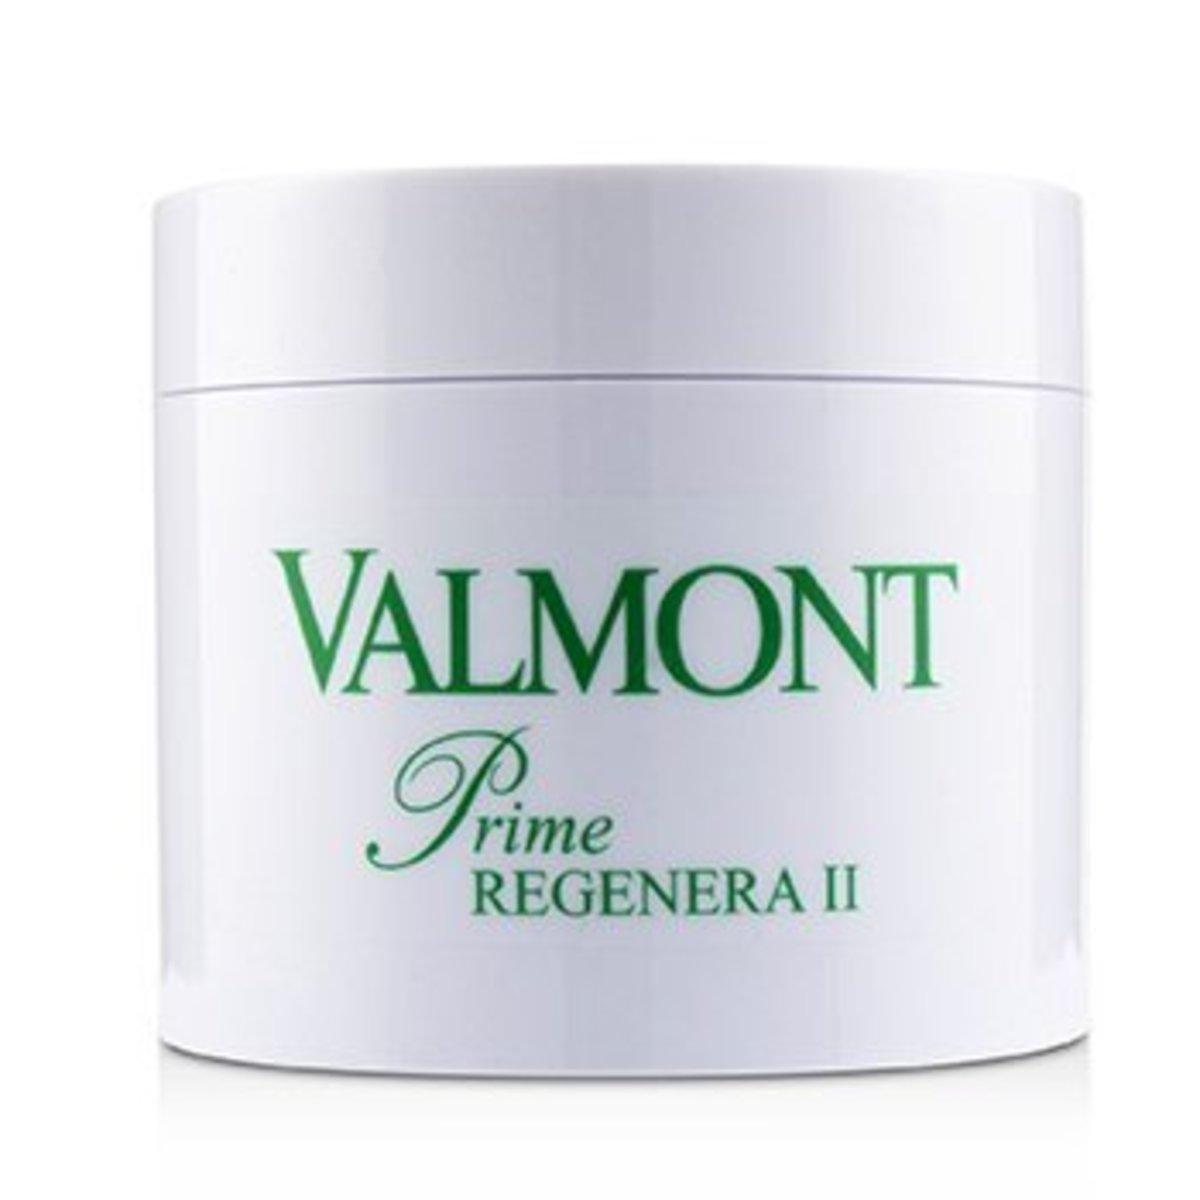 Valmont - Prime Regenera II (Salon Size 200ML) [ Parallel Import]